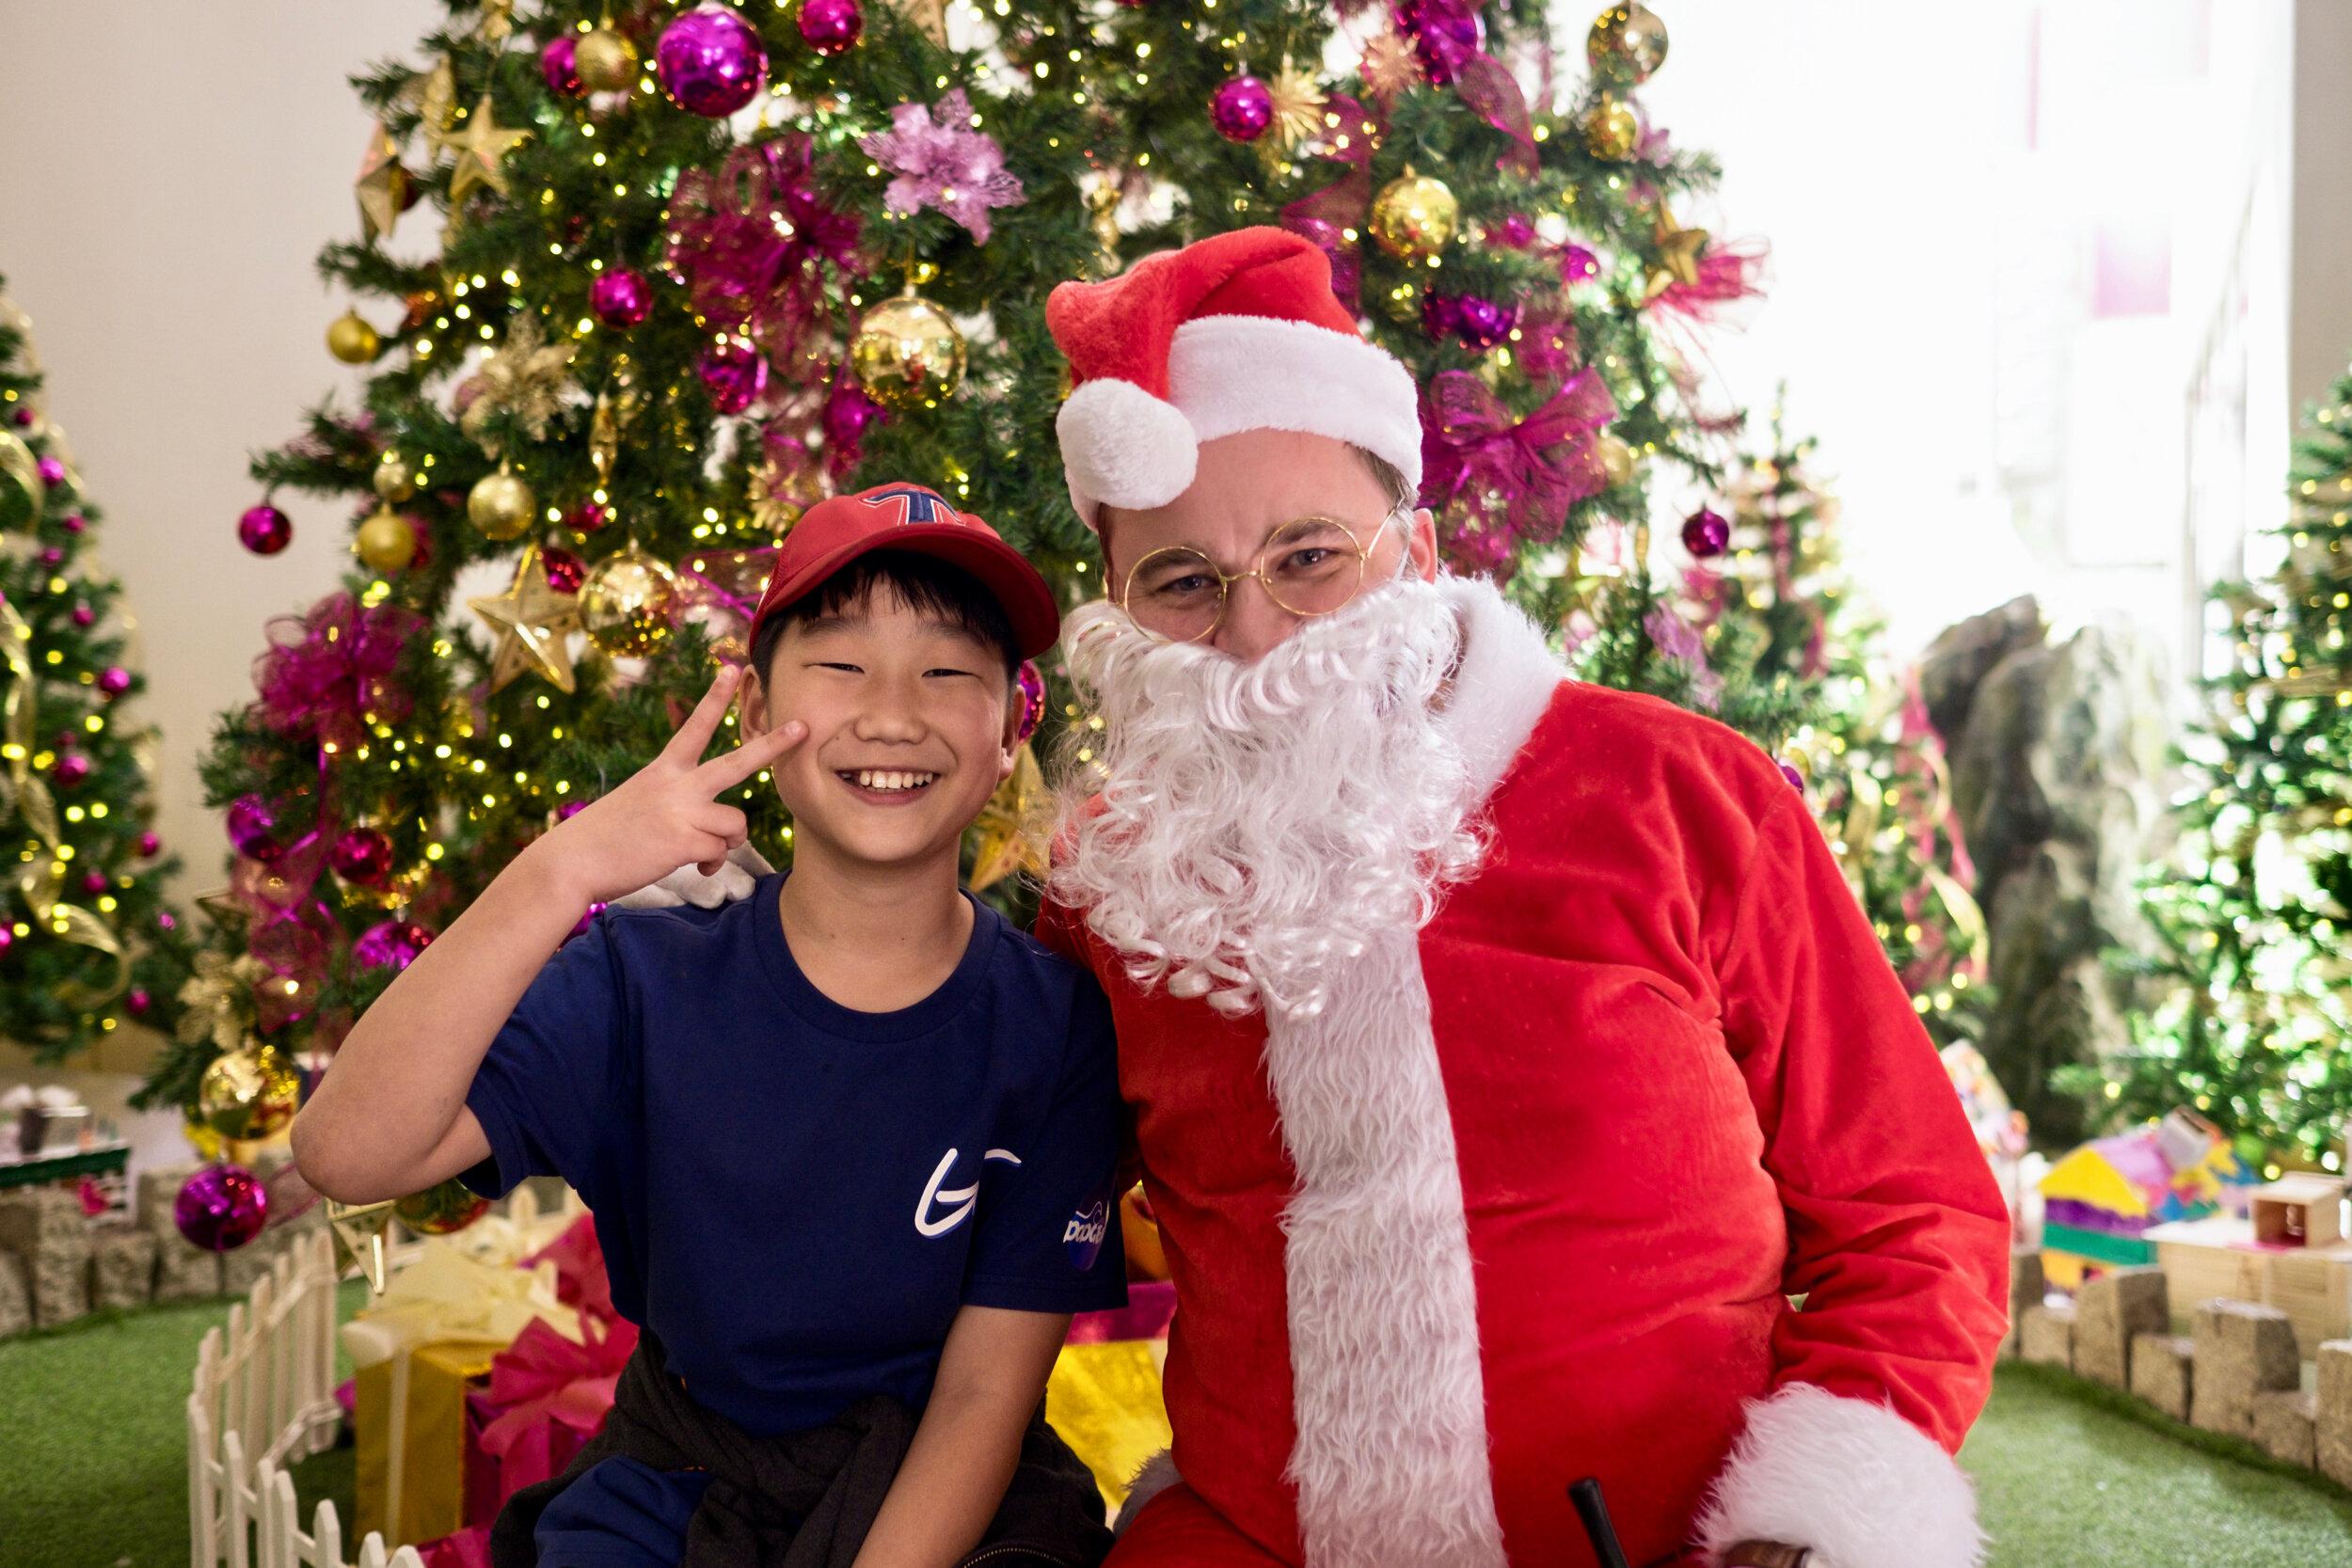 Photoshoot with Santa Clause-456.jpg